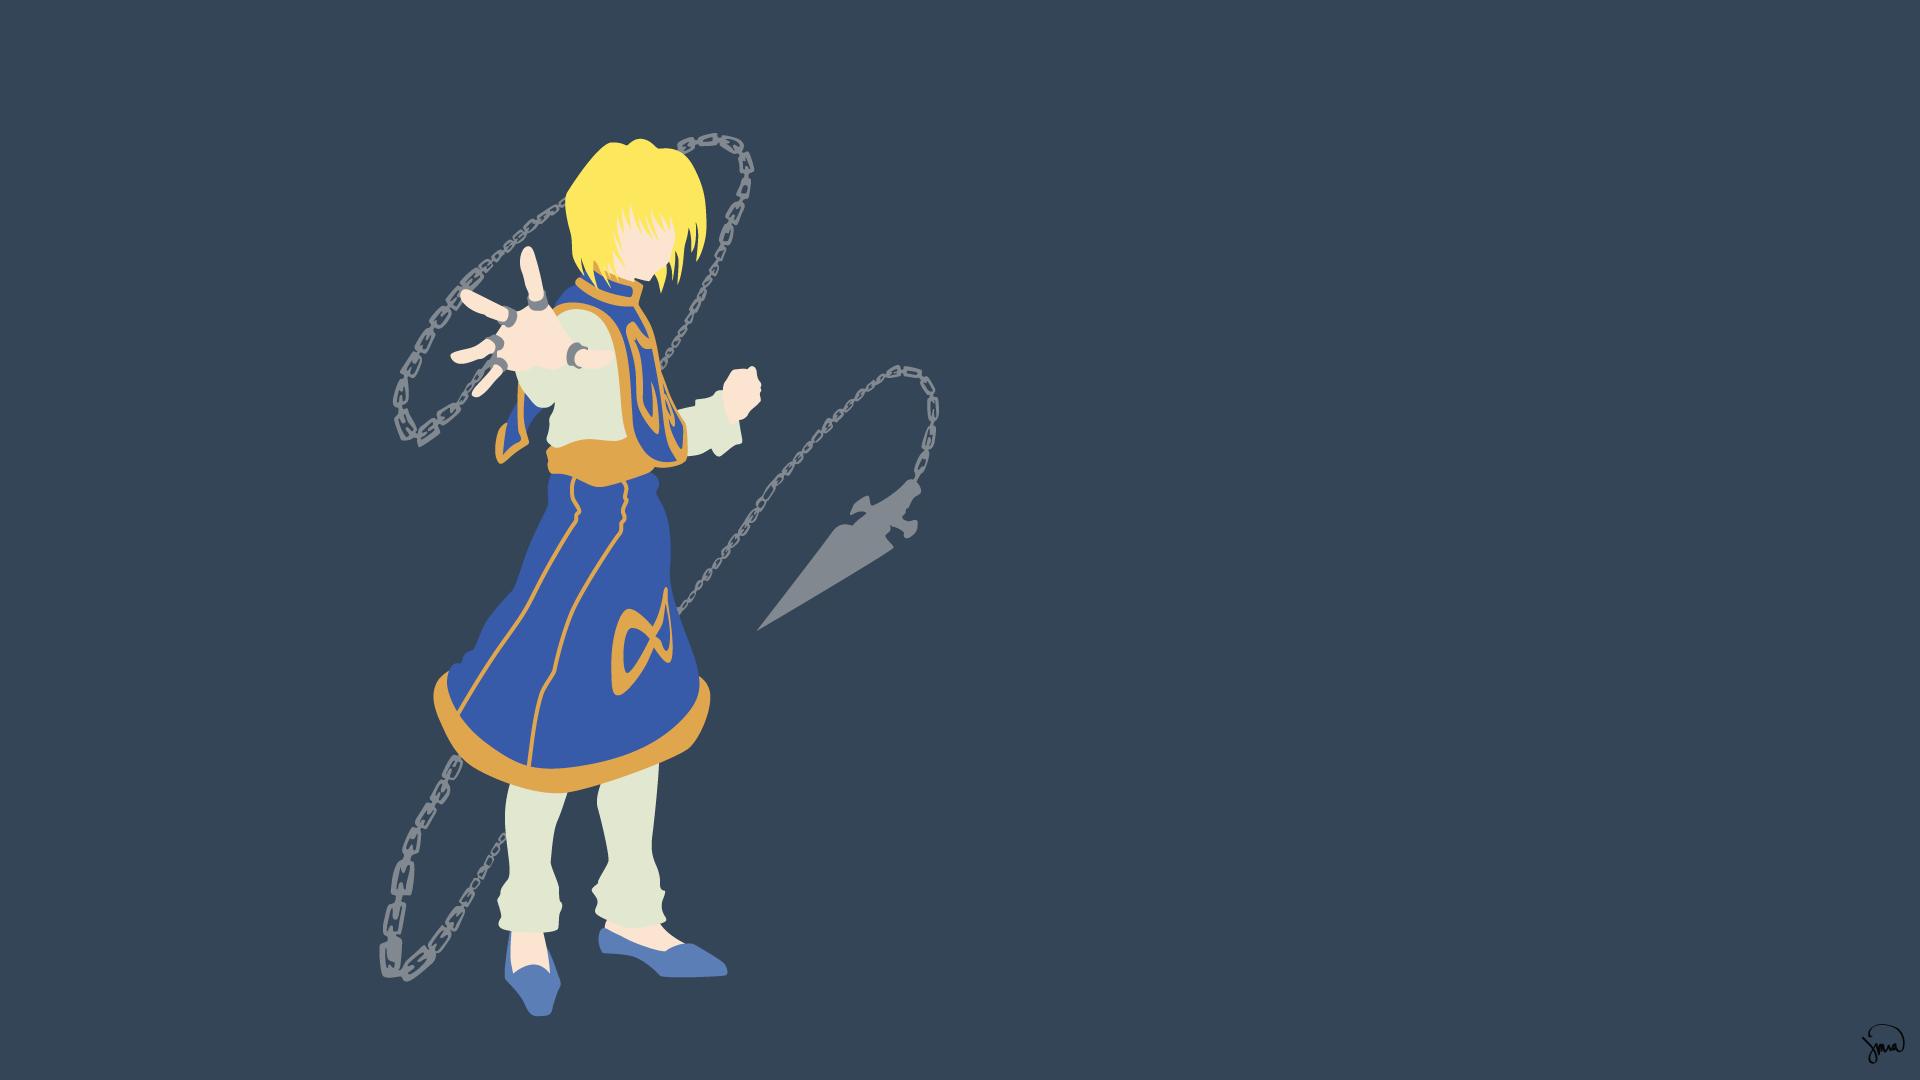 Pin On Anime Wallpaper Anime Pfp